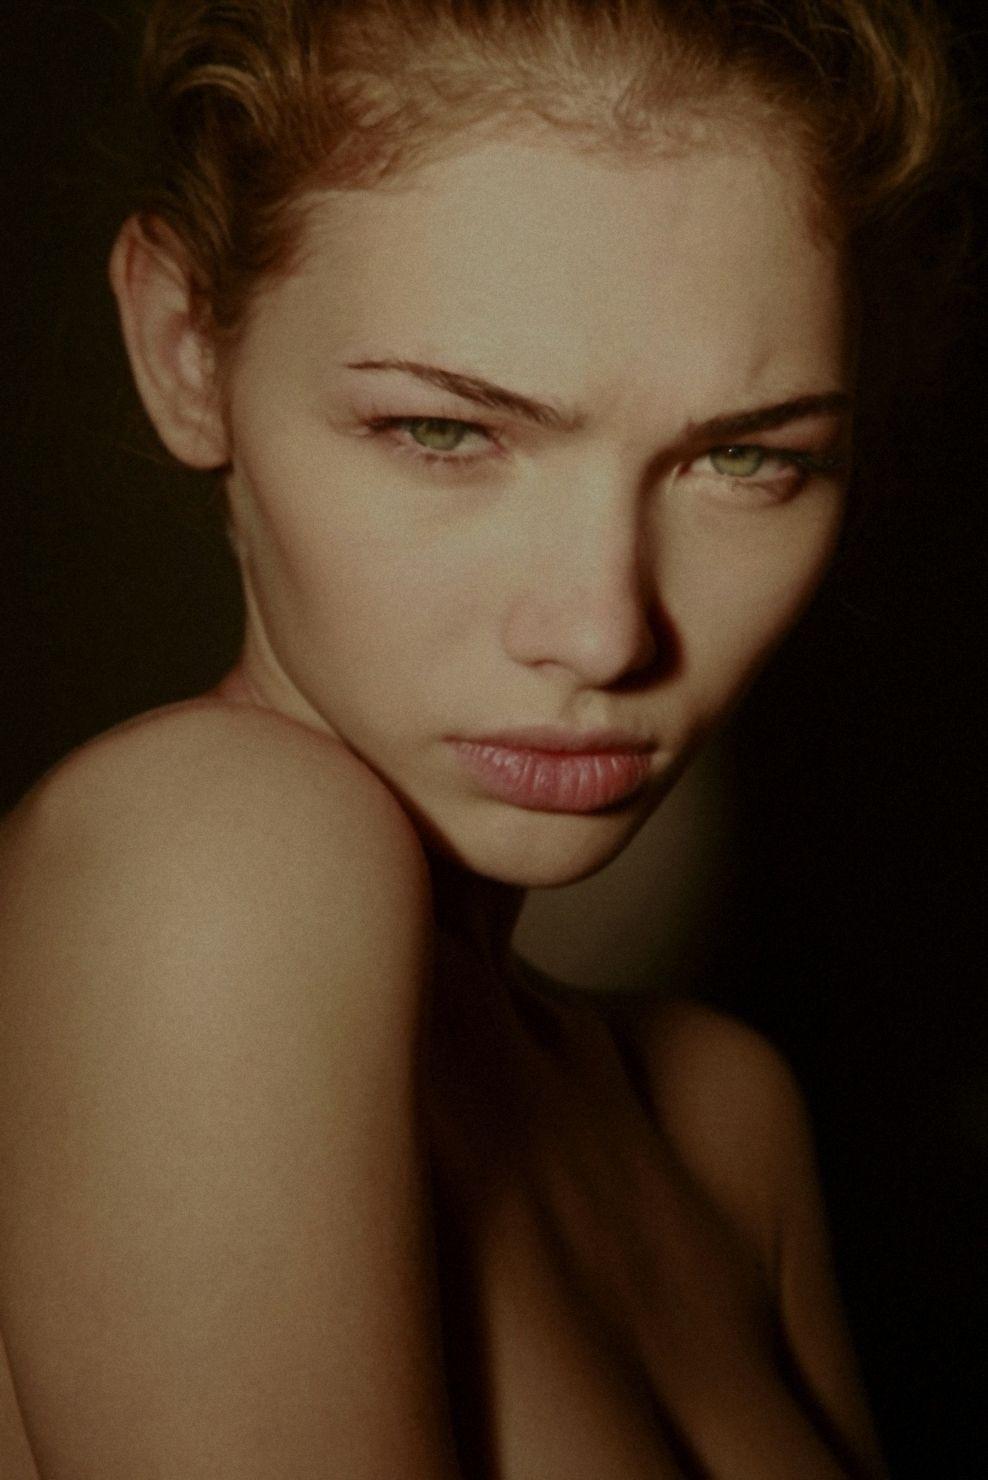 Mike Dowson photographer   ВКонтакте